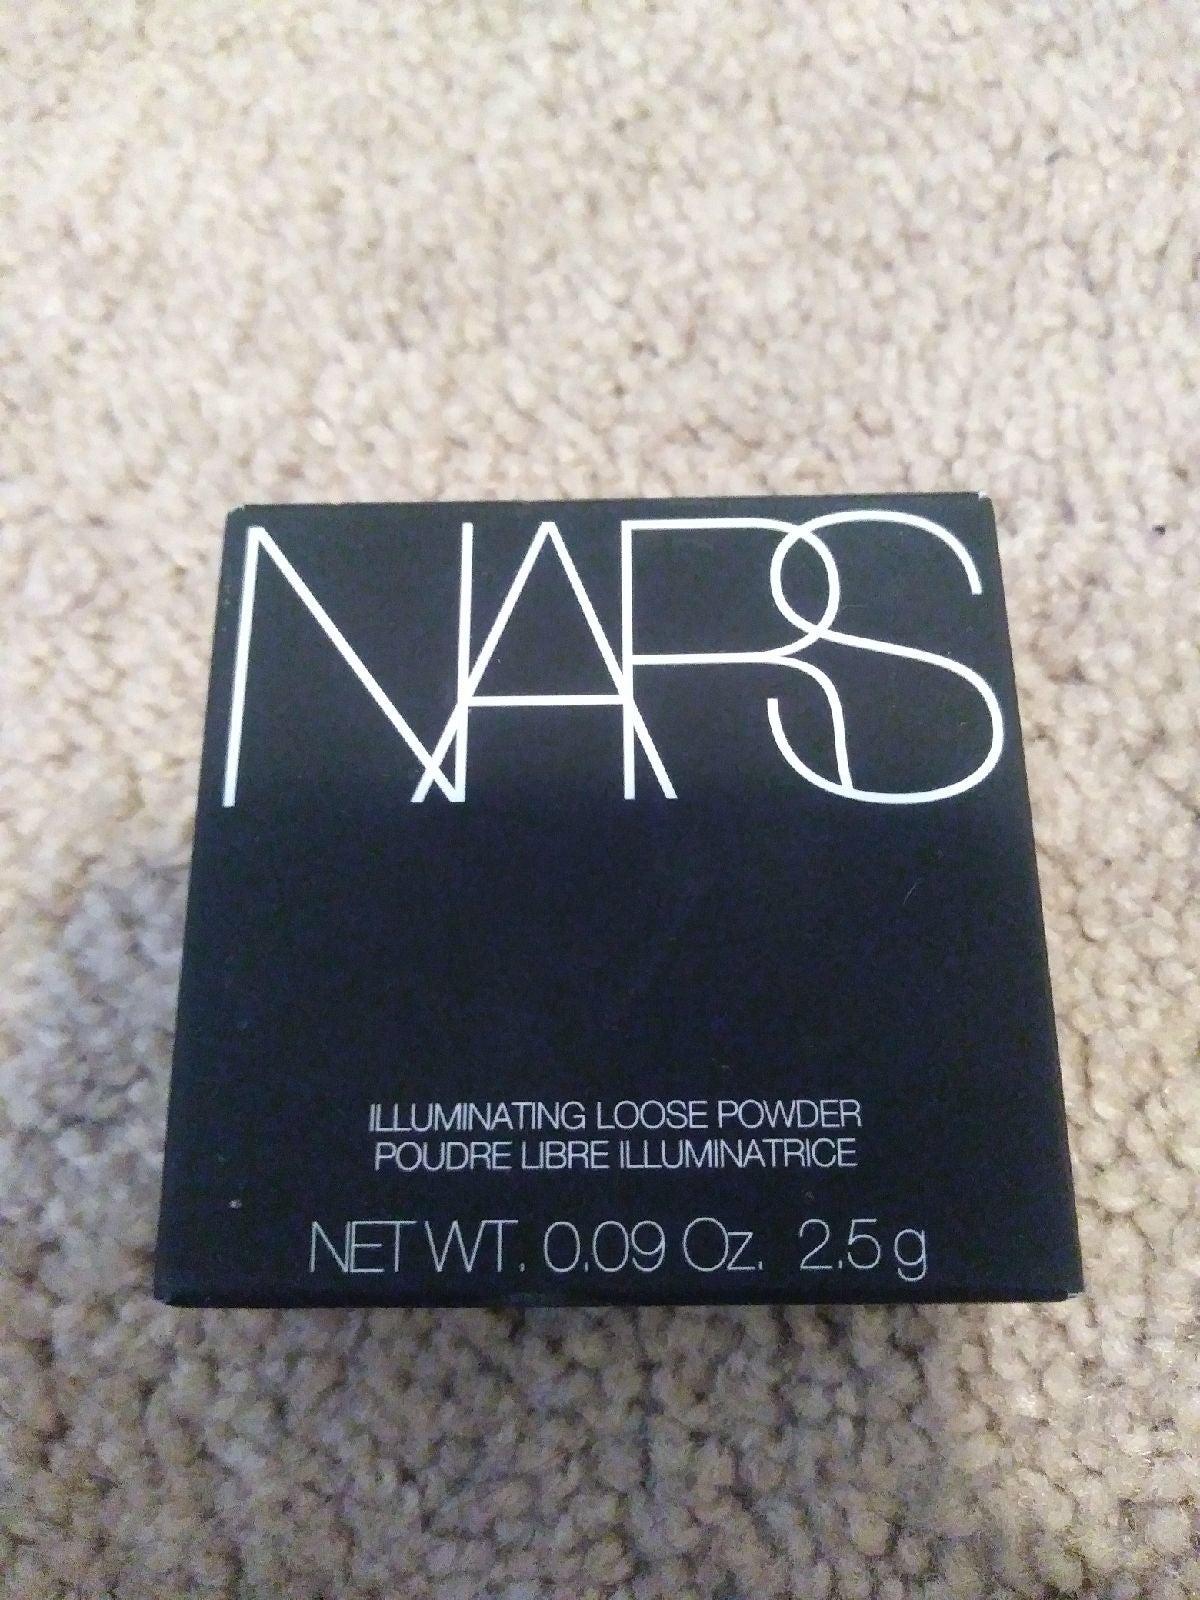 NARS illuminating loose powder